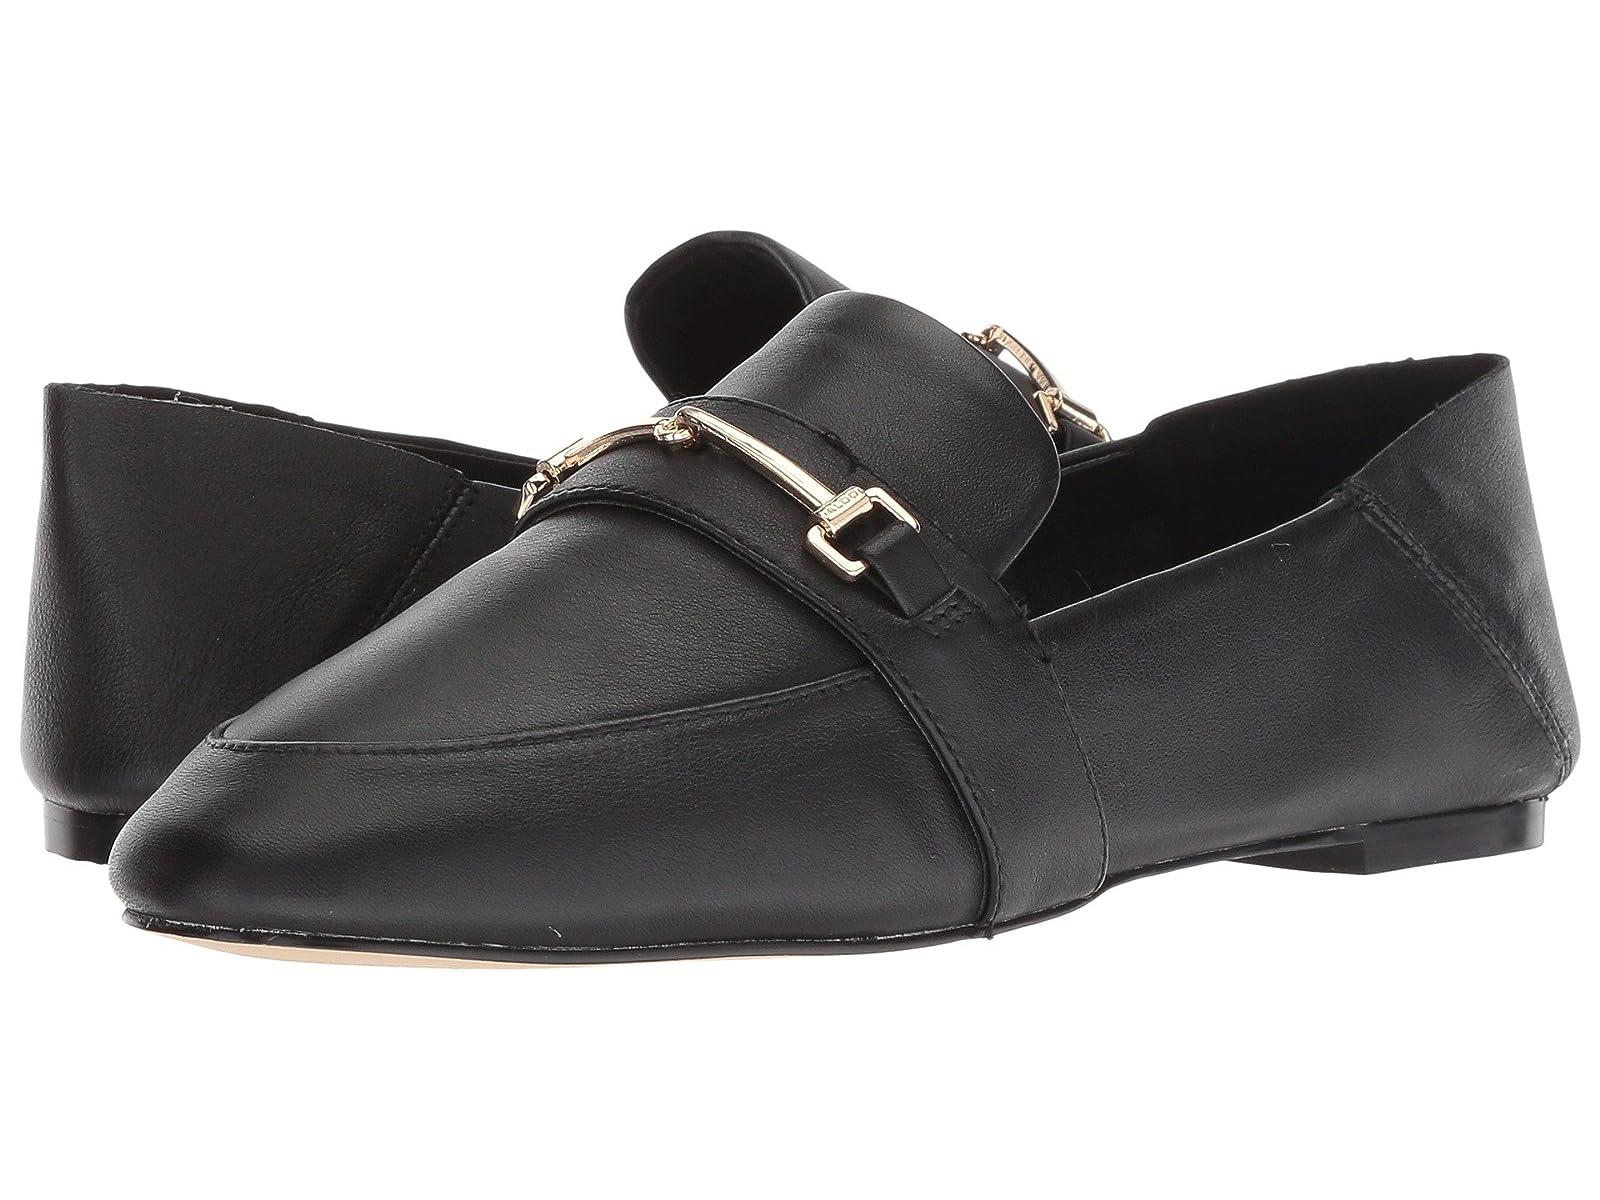 ALDO RyvielCheap and distinctive eye-catching shoes